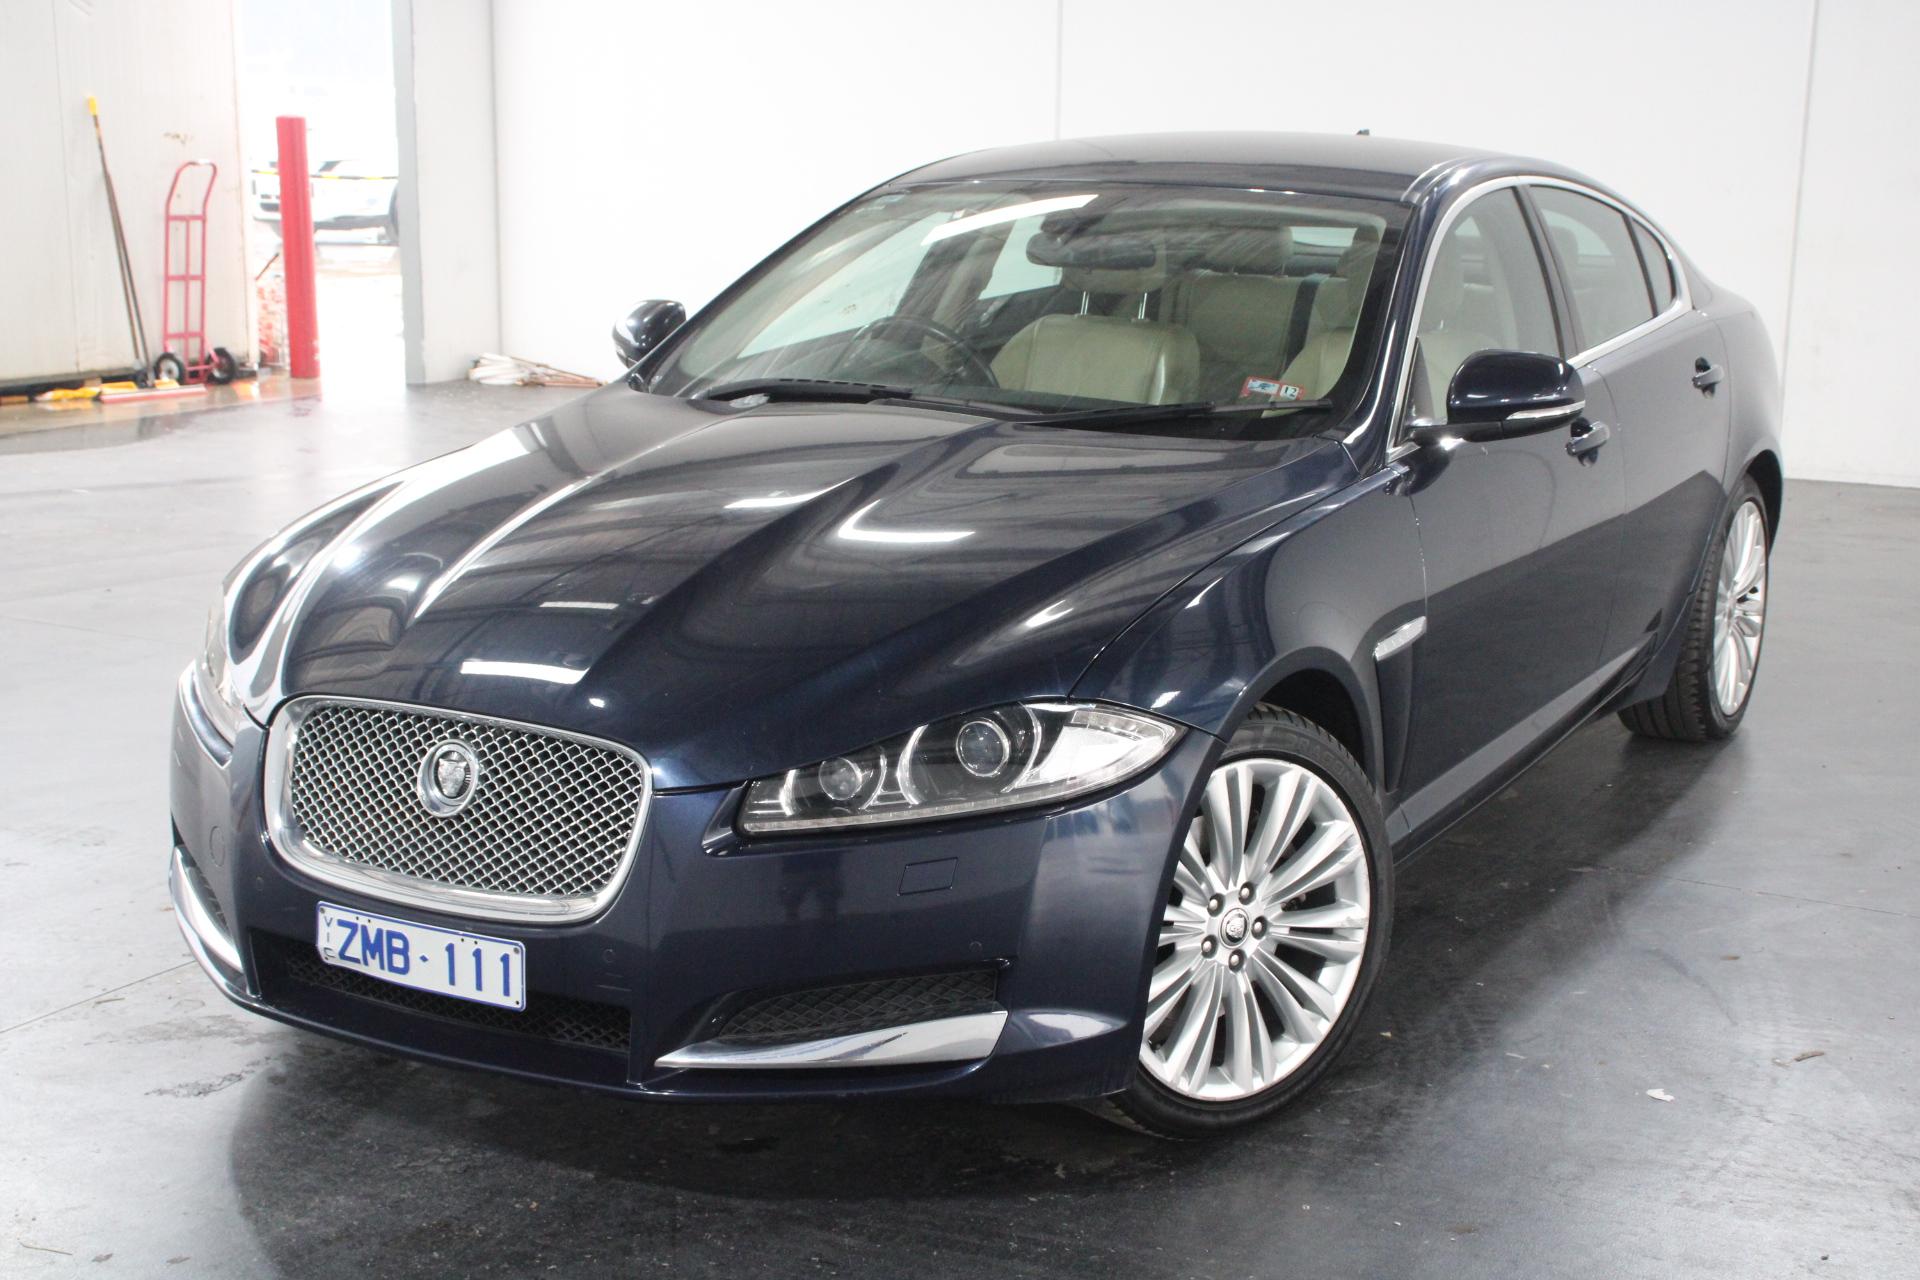 2012 Jaguar XF 2.0t Premium Luxury automatic Sedan